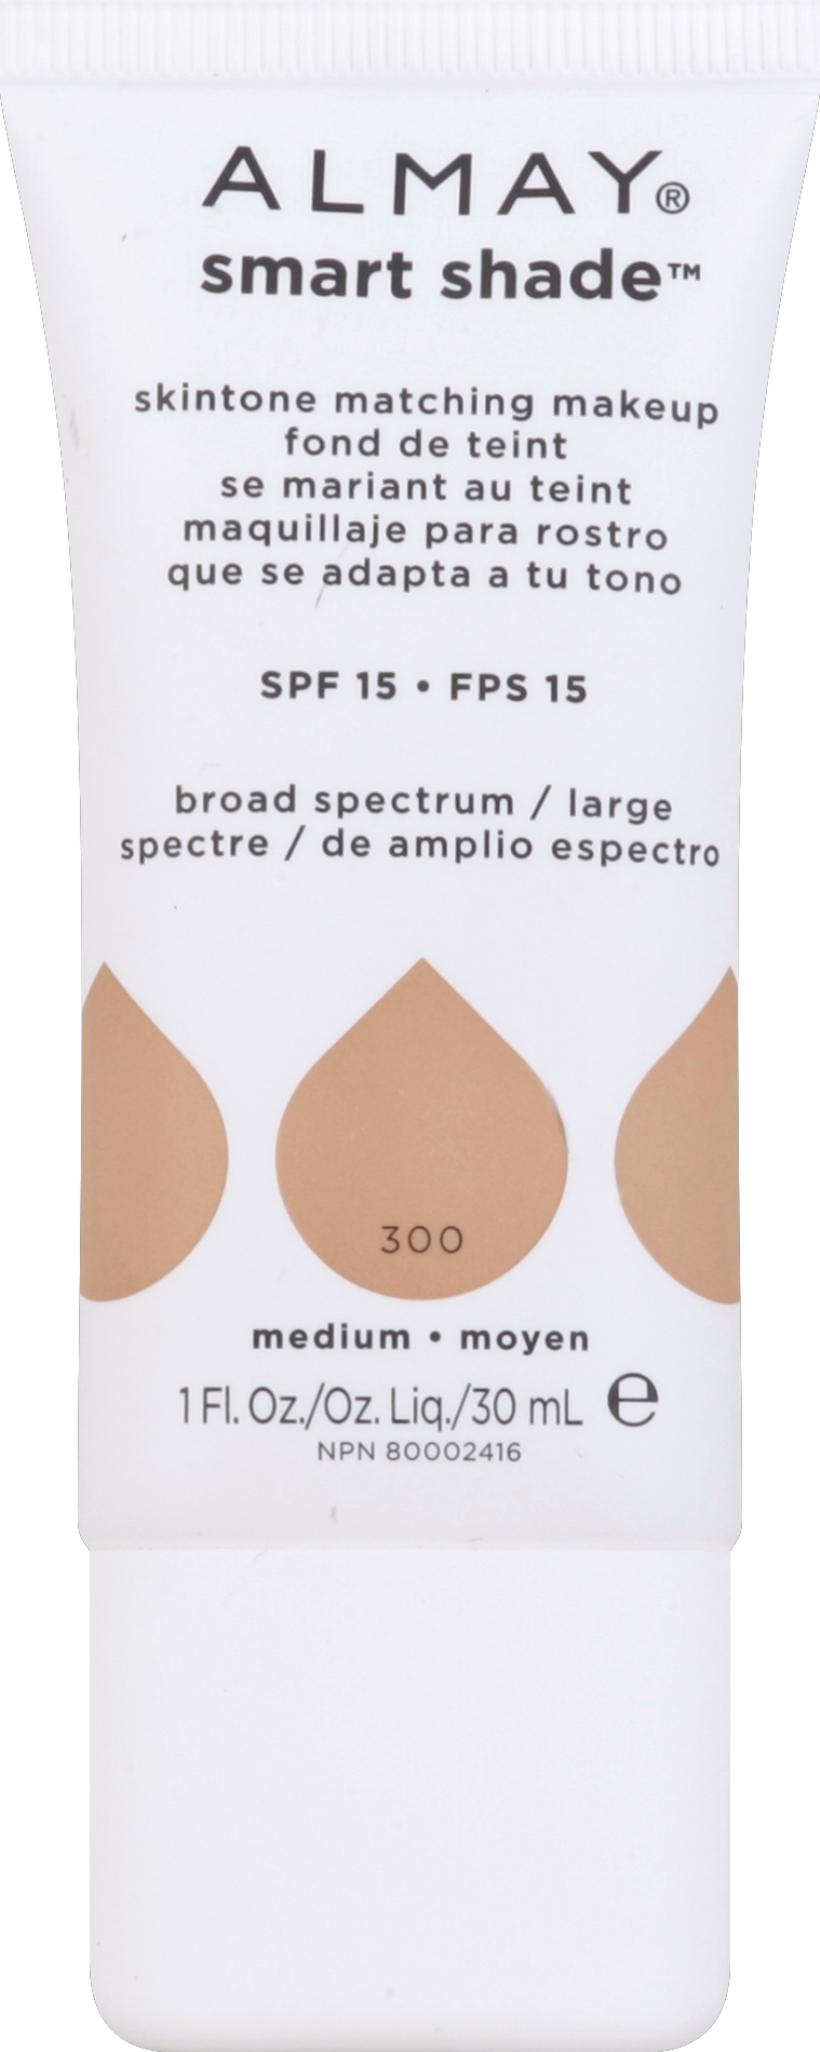 Almay Skintone Matching Makeup  Medium  1 fl oz (30 ml) PartNumber: 015W004004518001P KsnValue: 4004518 MfgPartNumber: 560303